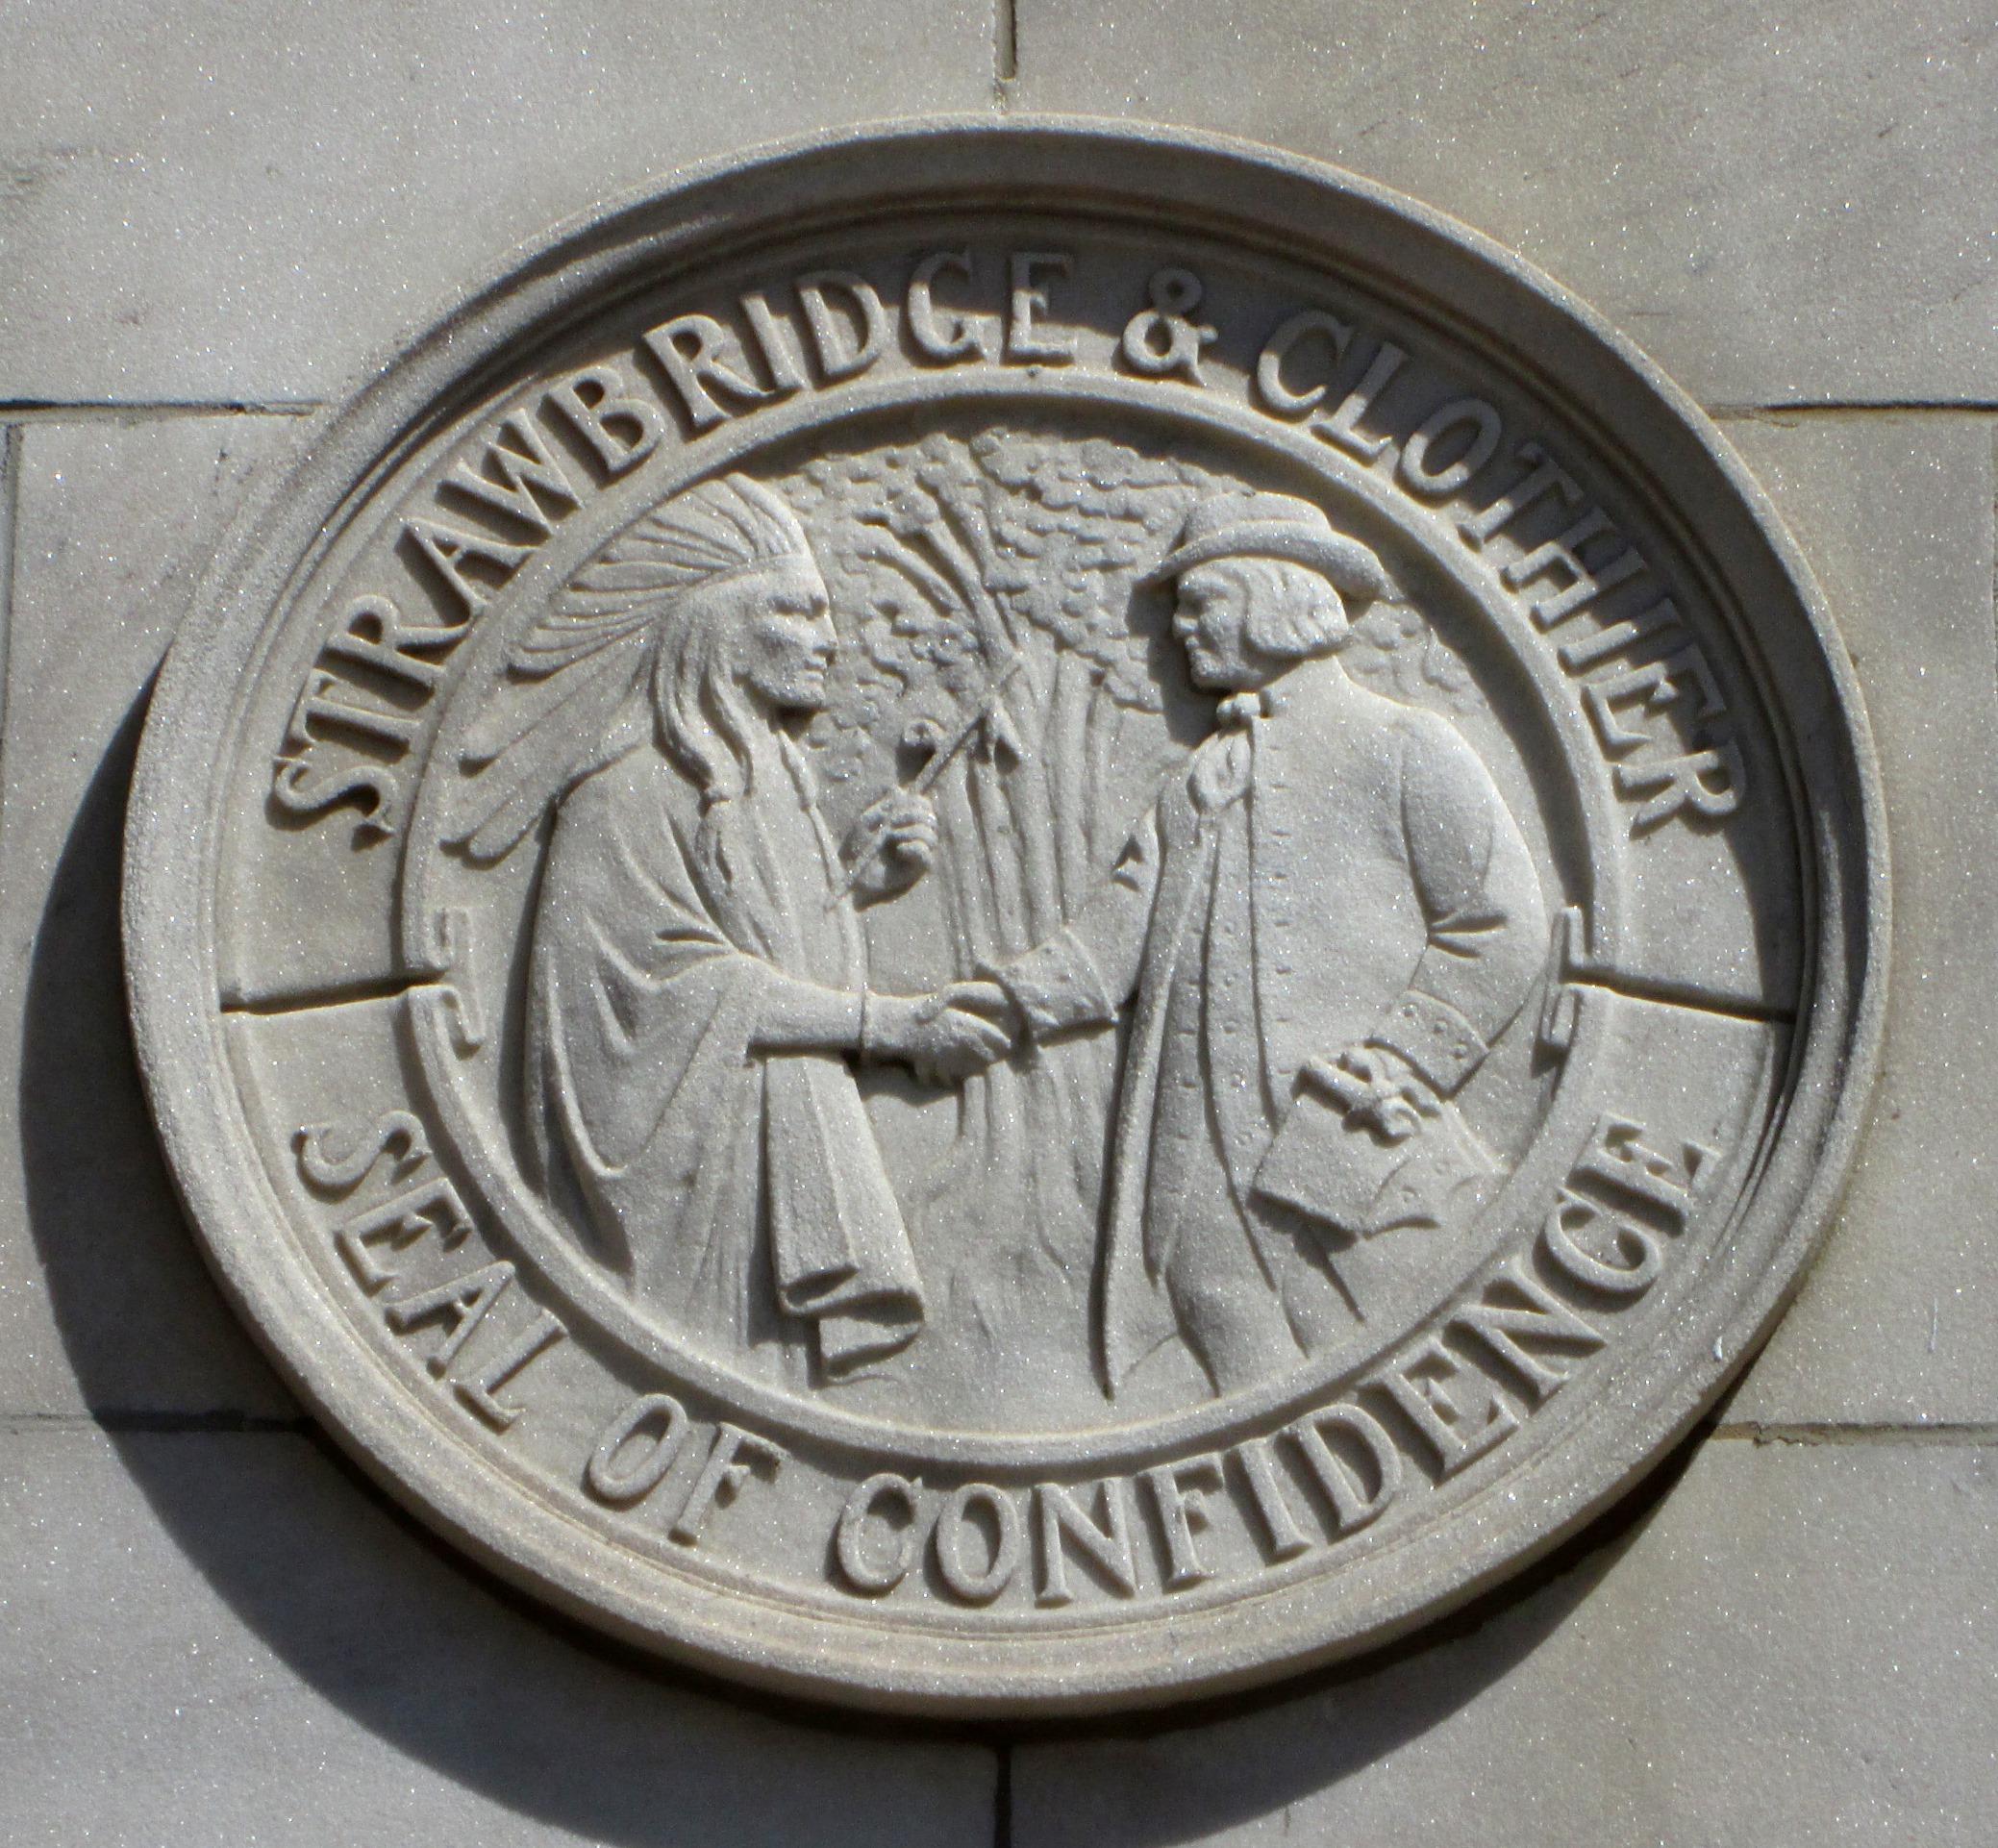 file strawbridge clothier 1897 seal of confidence jpg file strawbridge clothier 1897 seal of confidence jpg